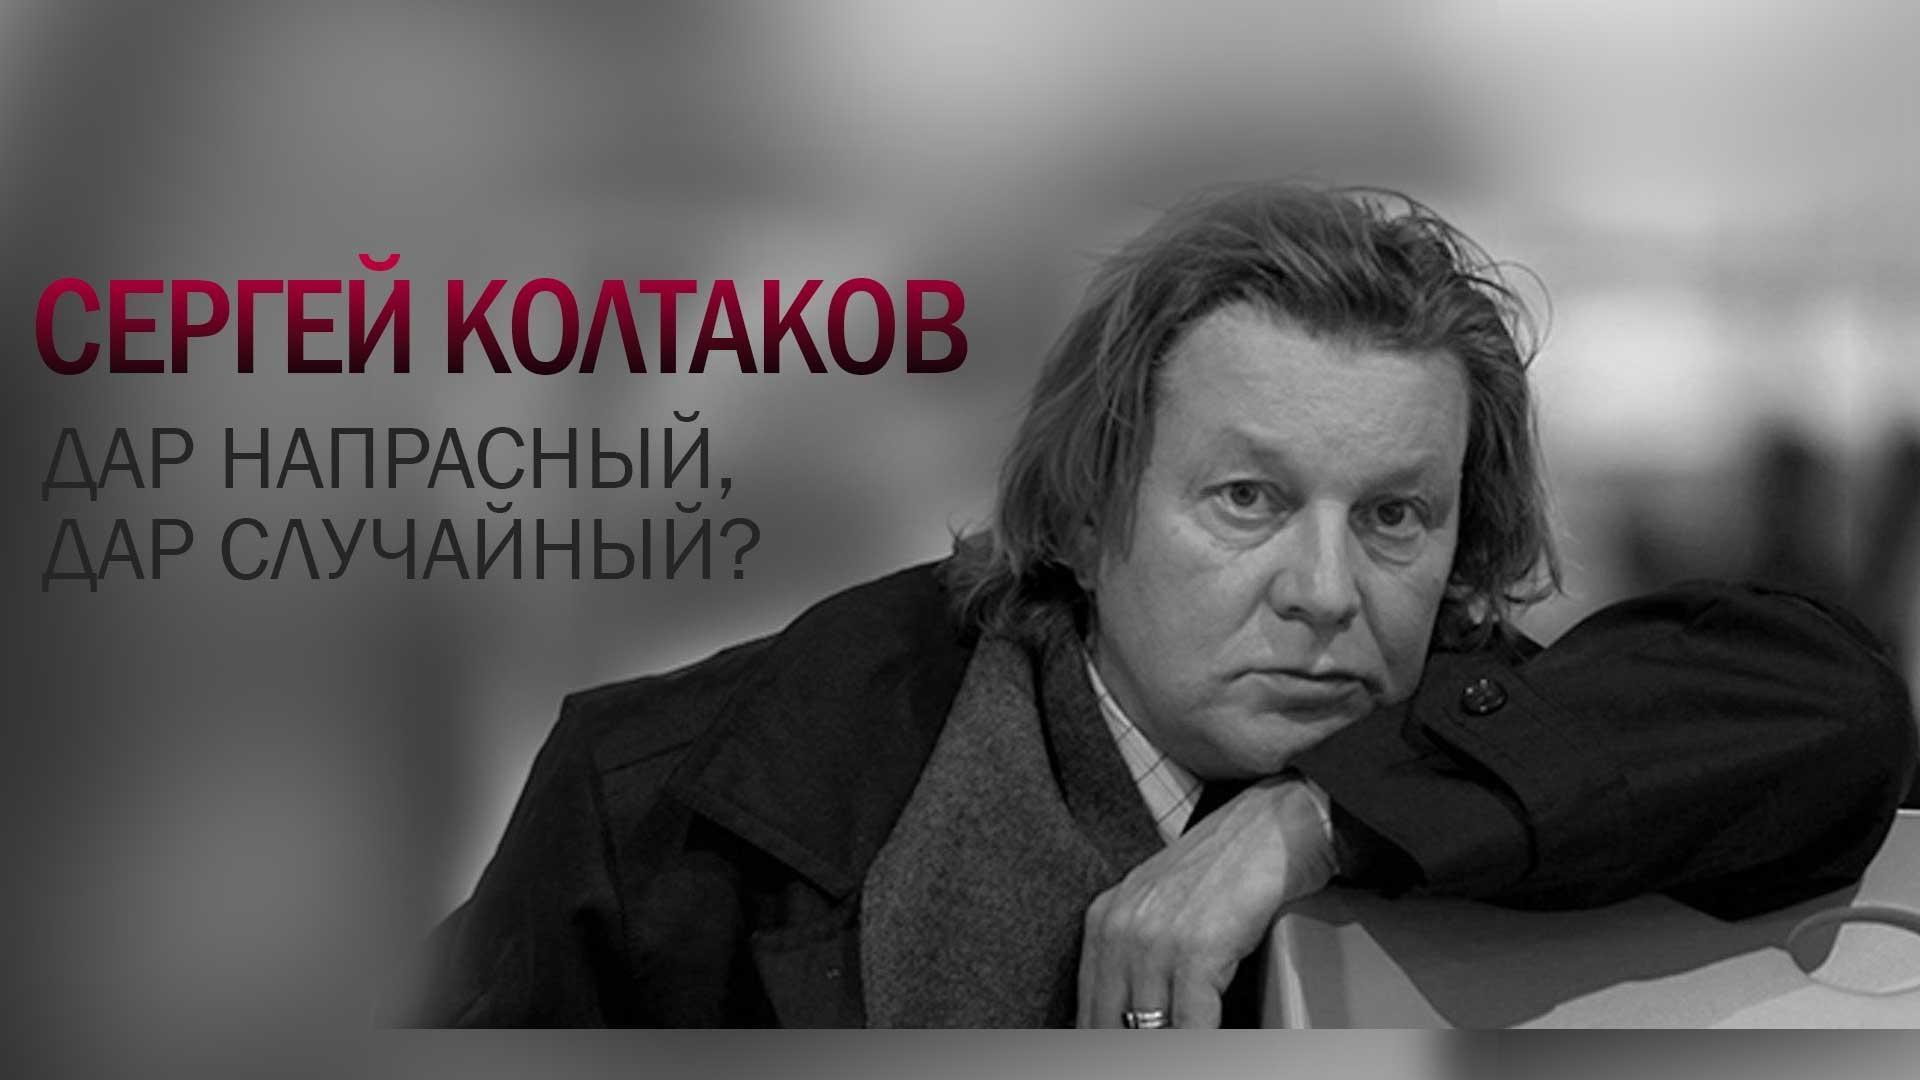 Сергей Колтаков. Дар напрасный, дар случайный?